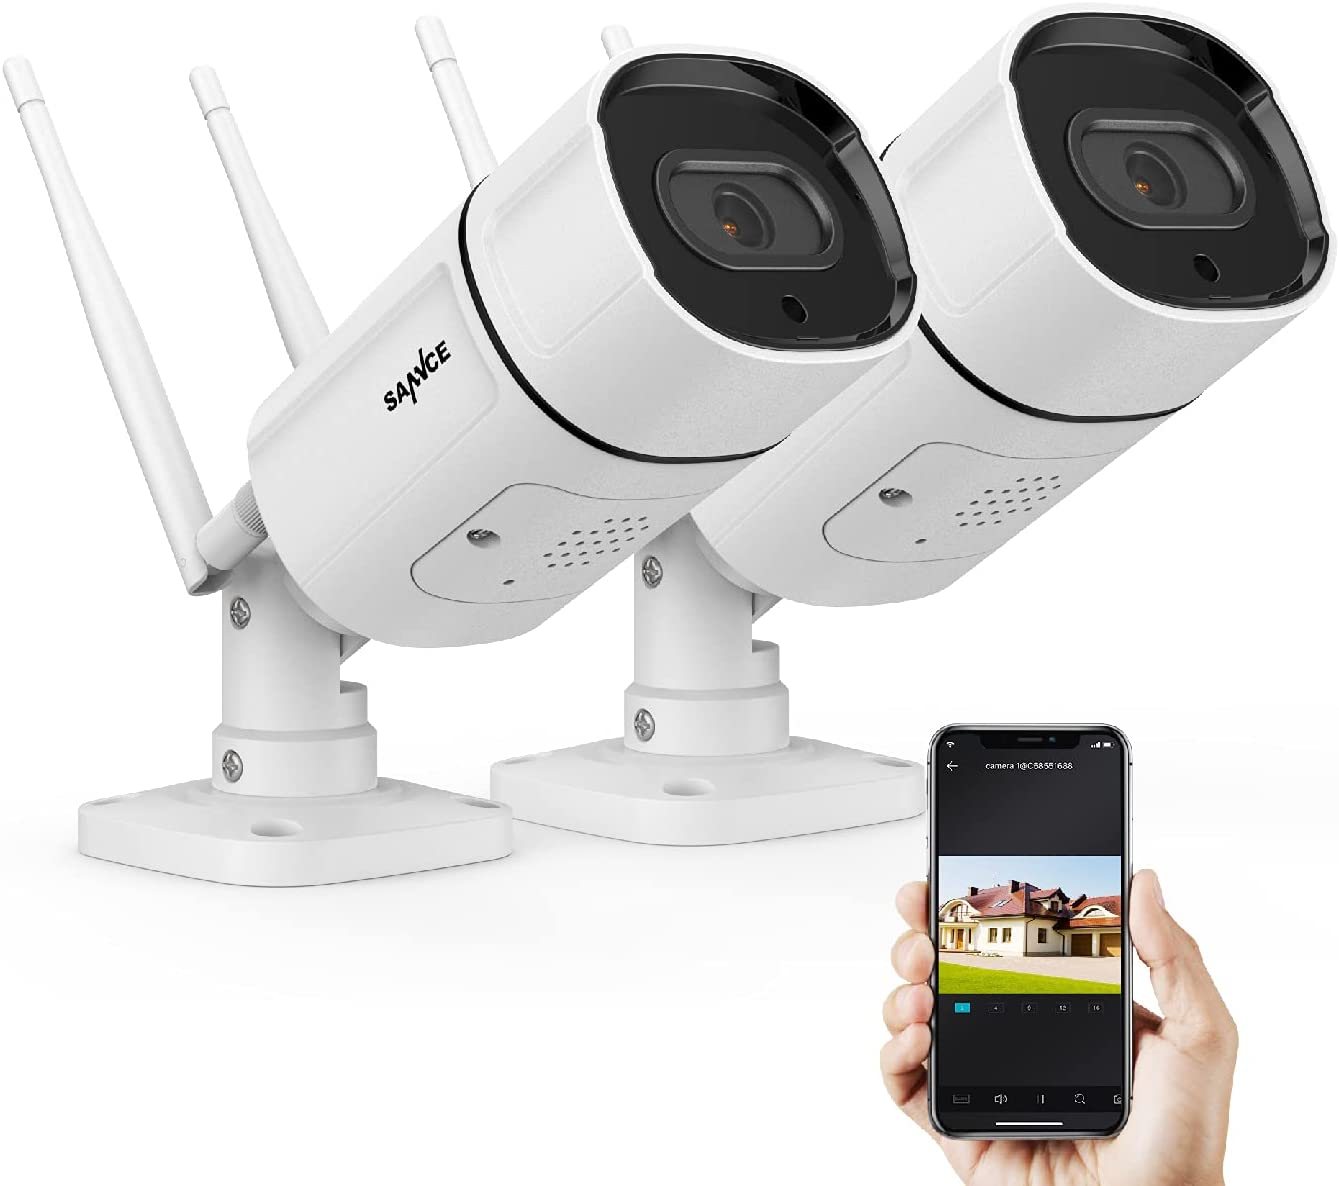 供え 2K 3MP Wireless IP Camera 返品不可 SANNCE Outdoor Super HD Secu